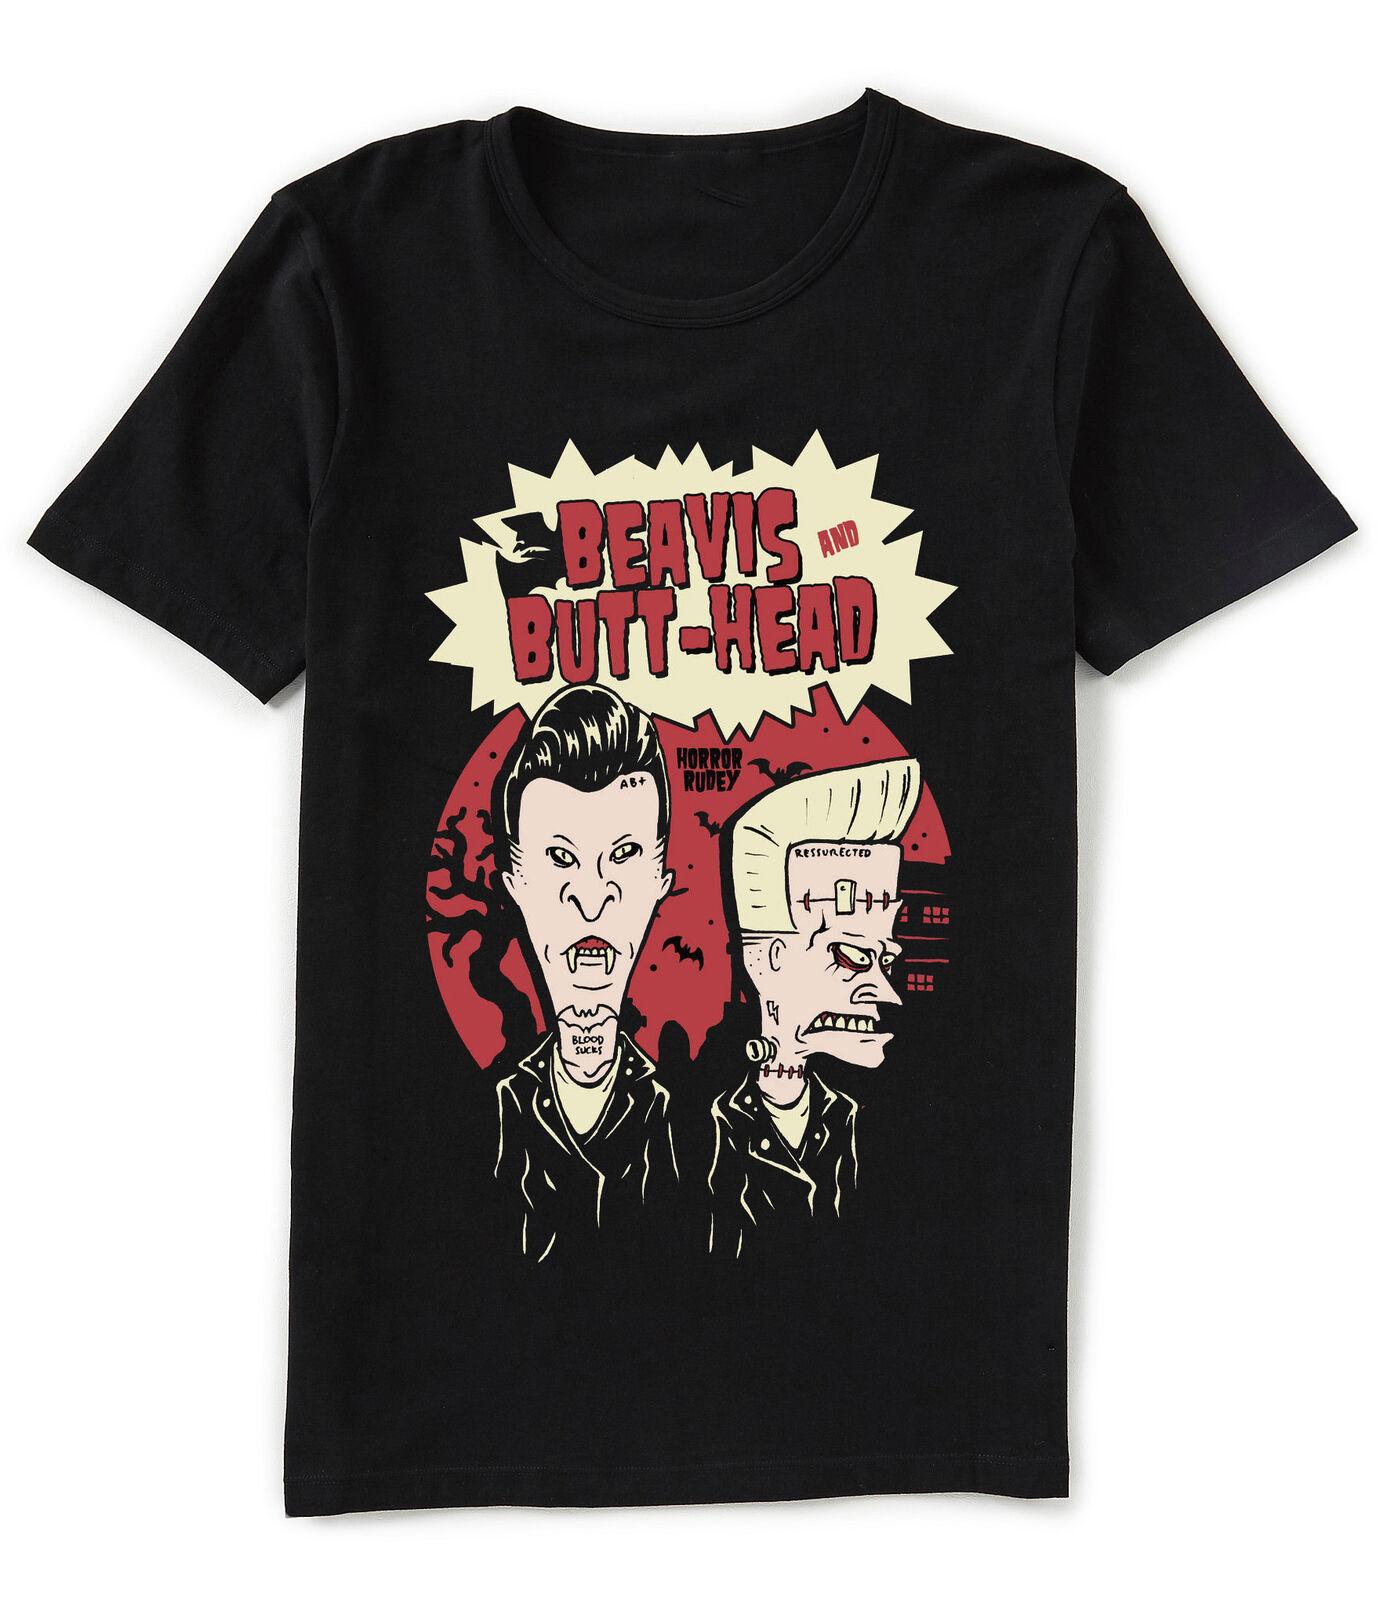 Beavis y Butthead Horror Rudey vampiro y Frankenstein camiseta negra Camiseta de algodón clásico cuello Camiseta de manga corta Camiseta